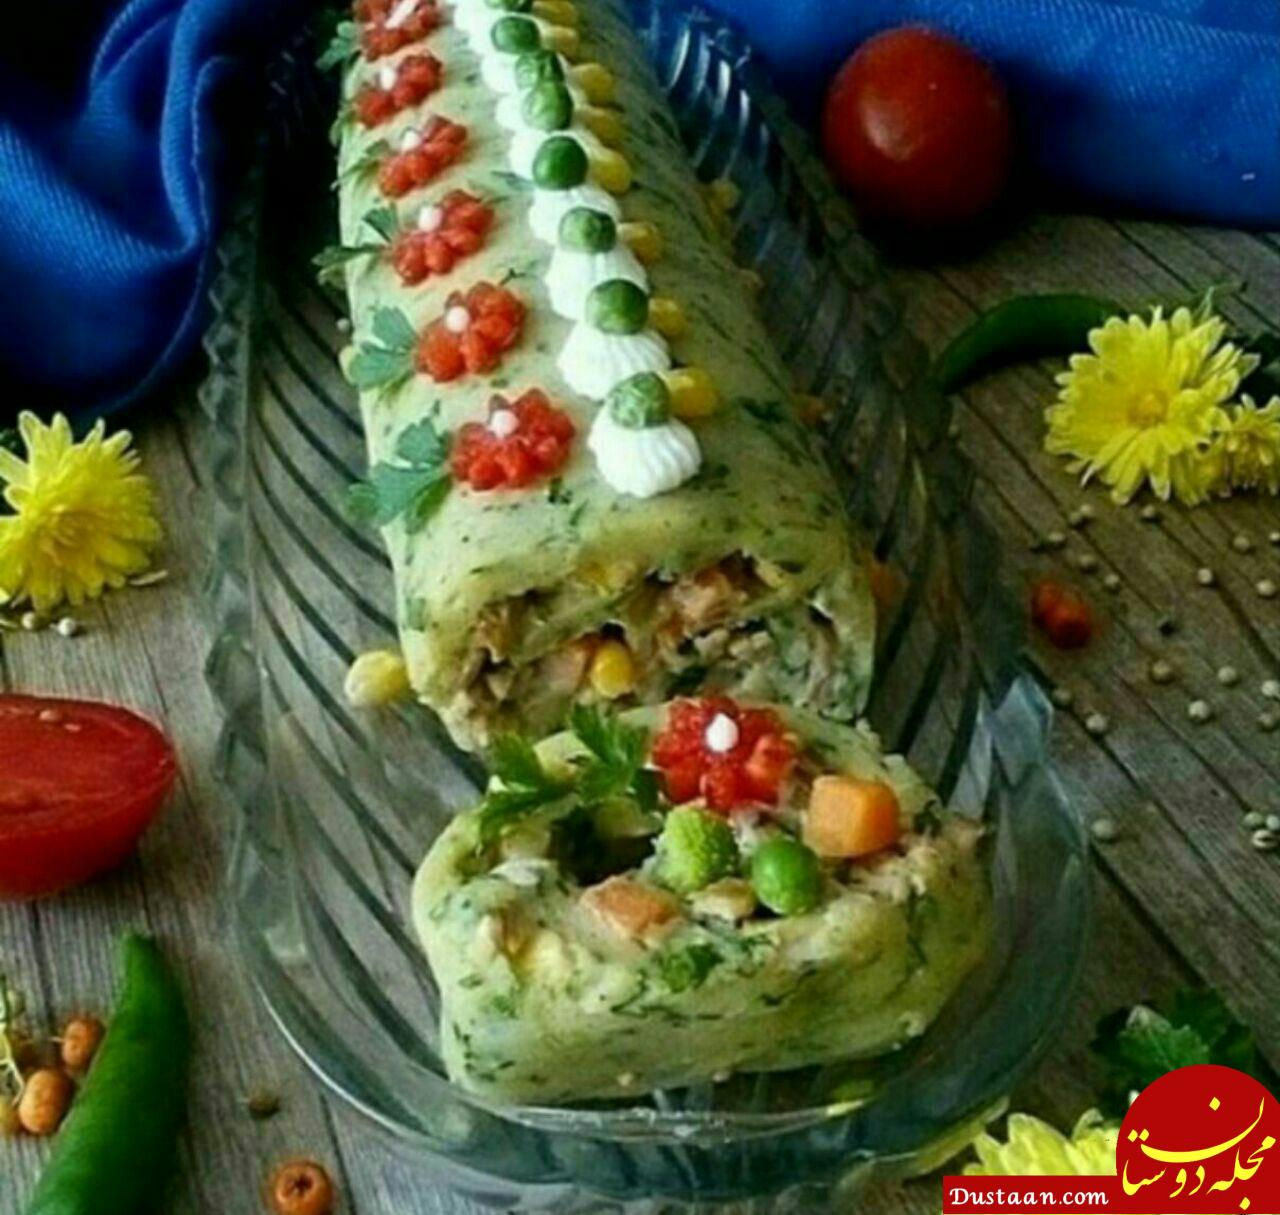 www.dustaan.com طرز تهیه رول سیب زمینی به سبکی خوشمزه